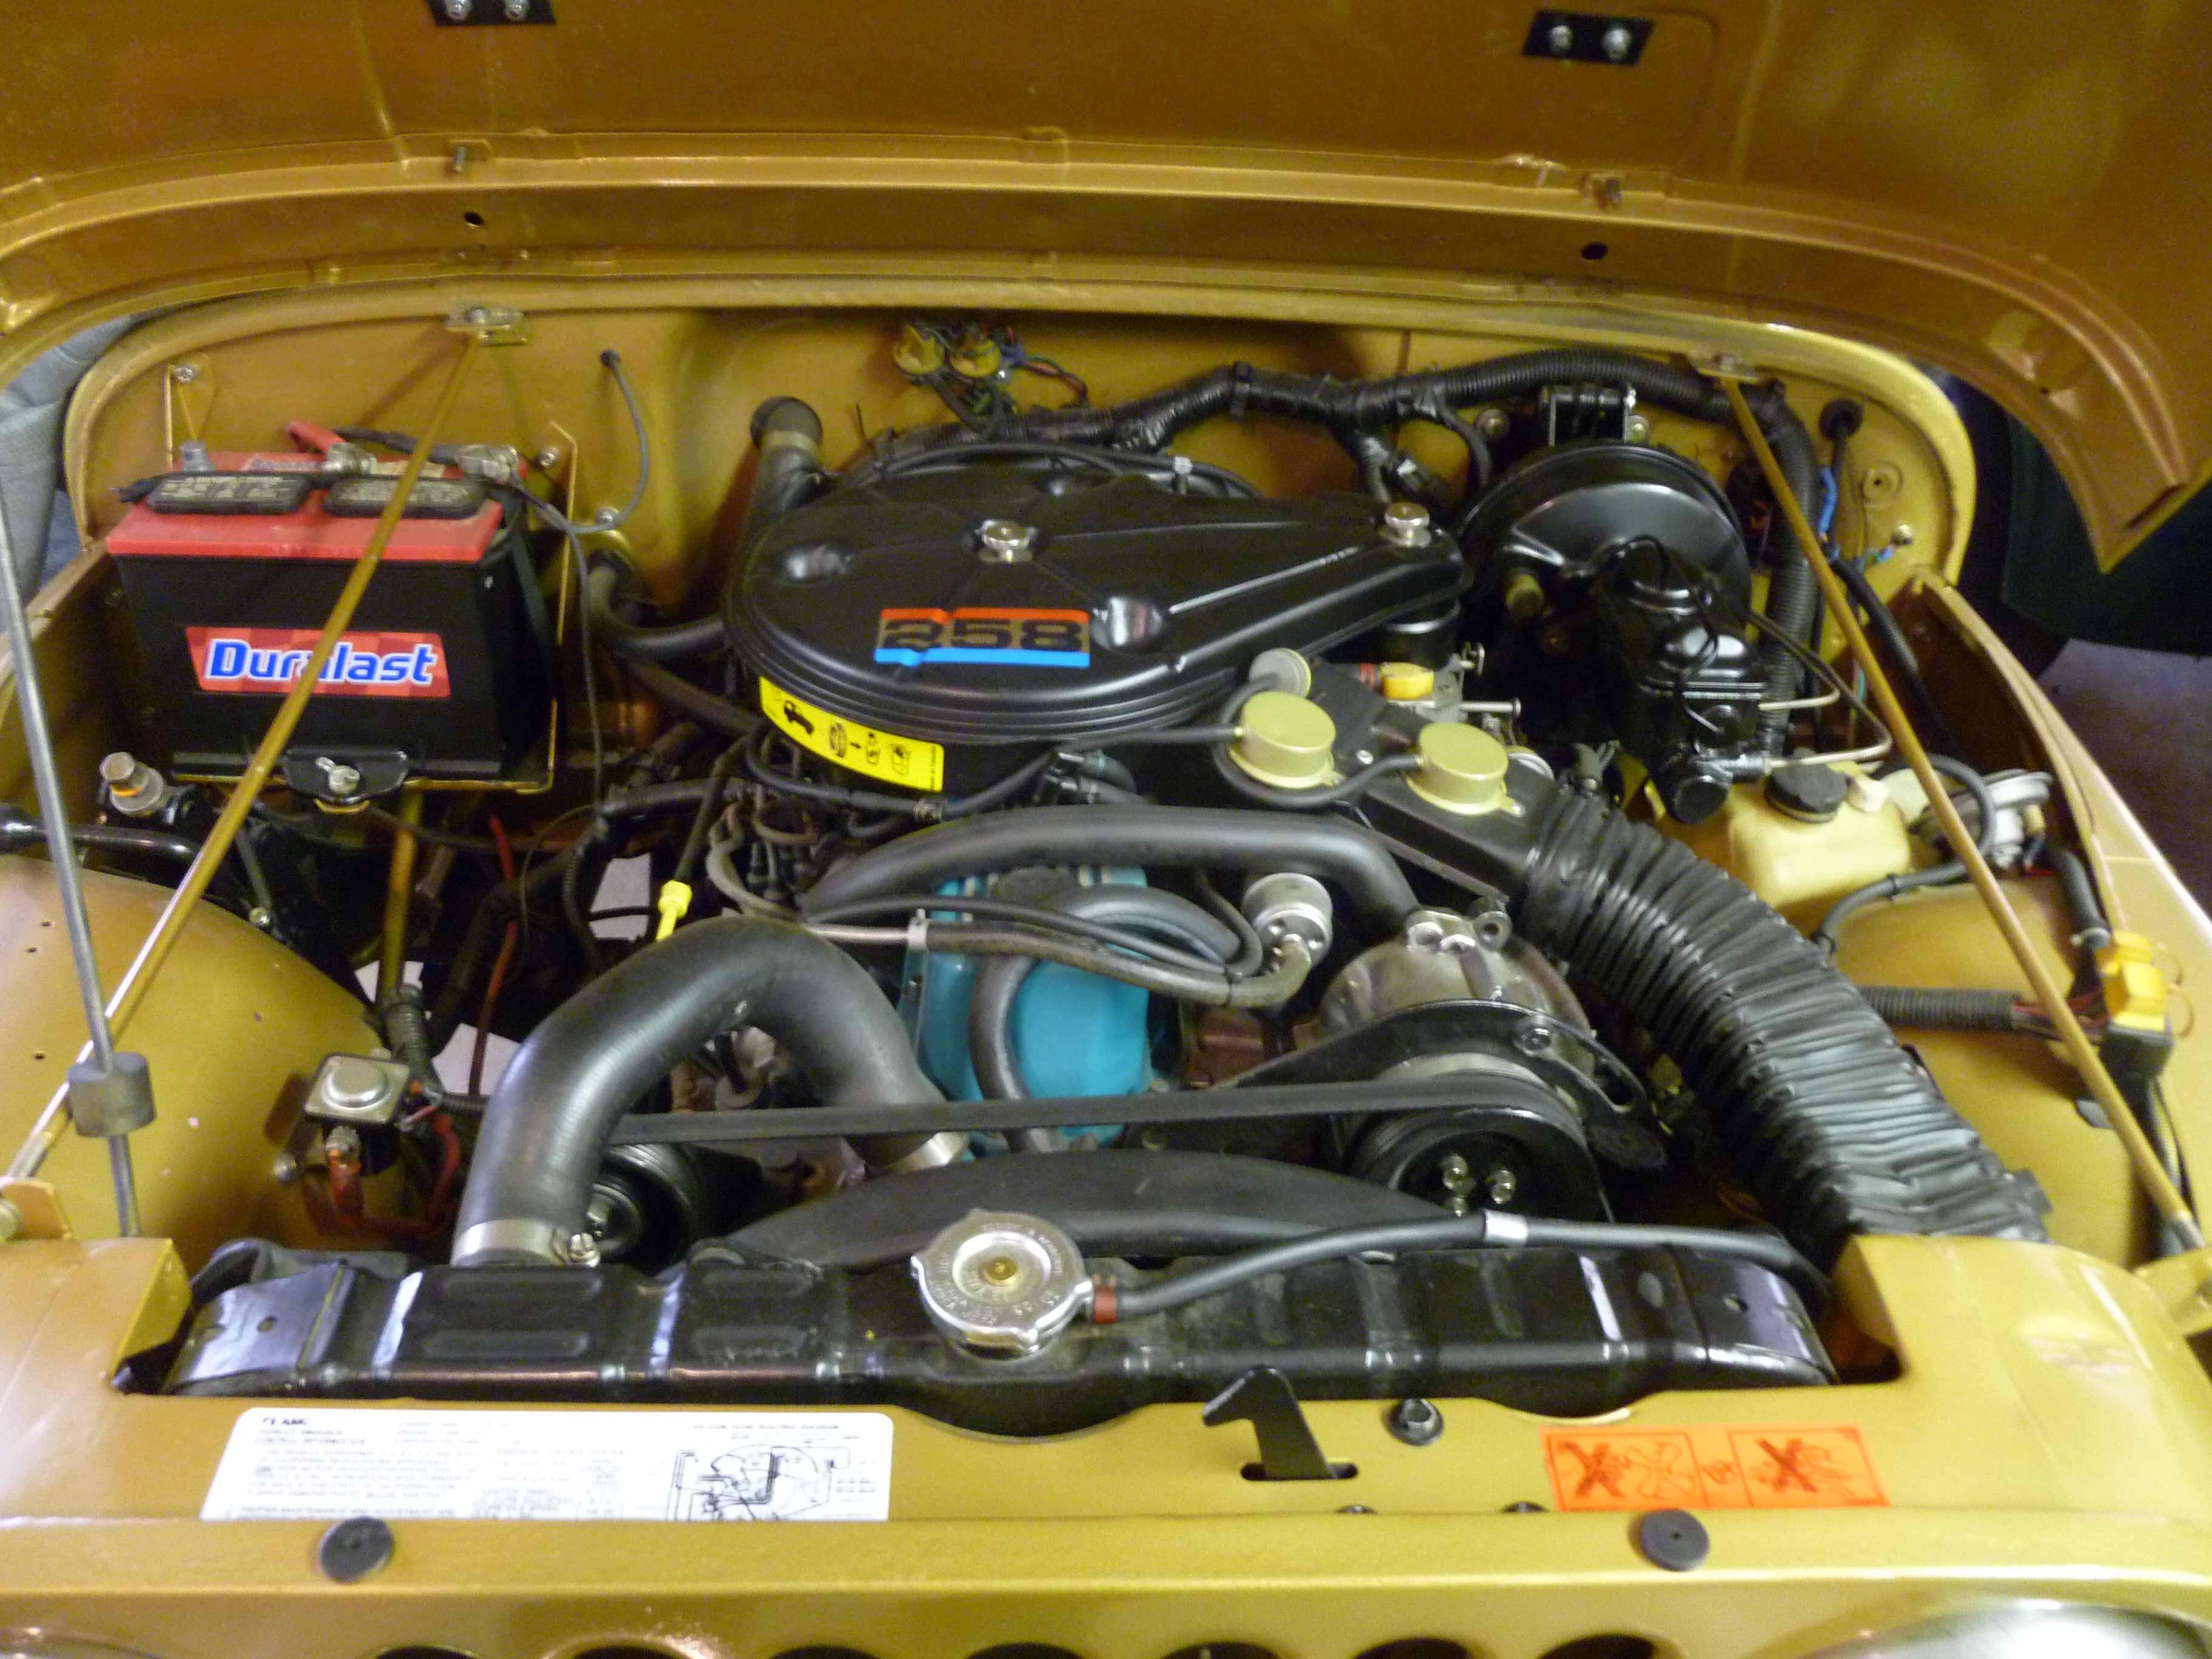 1982 jeep cj7 151ci engine schematics